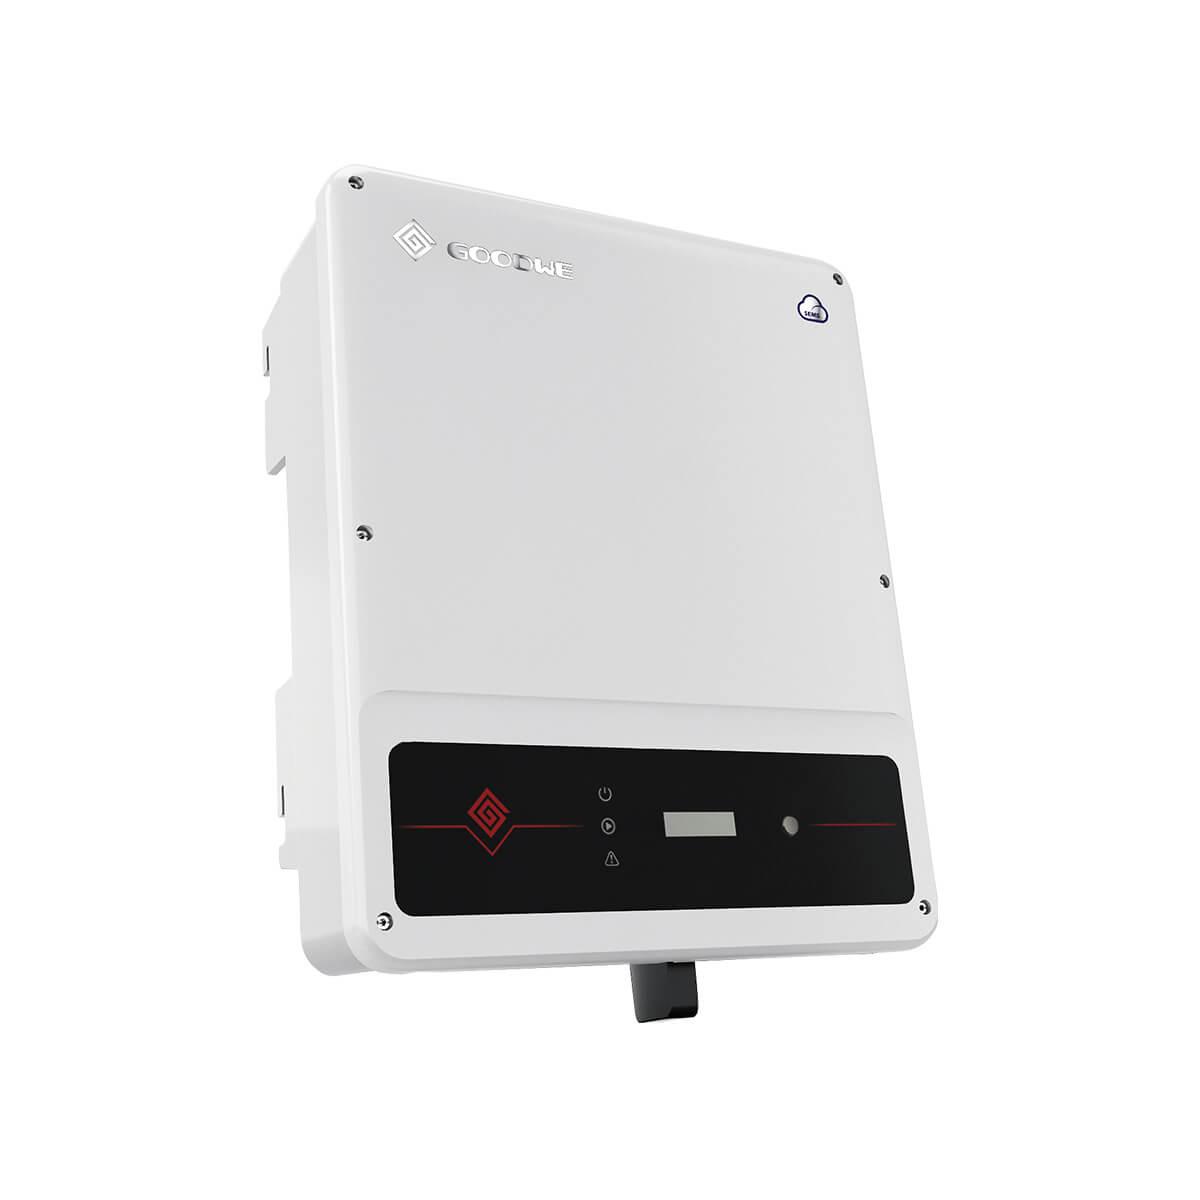 goodwe 15kW inverter, goodwe gw15kt-dt 15kW inverter, goodwe gw15kt-dt inverter, goodwe gw15kt-dt, goodwe 15 kW